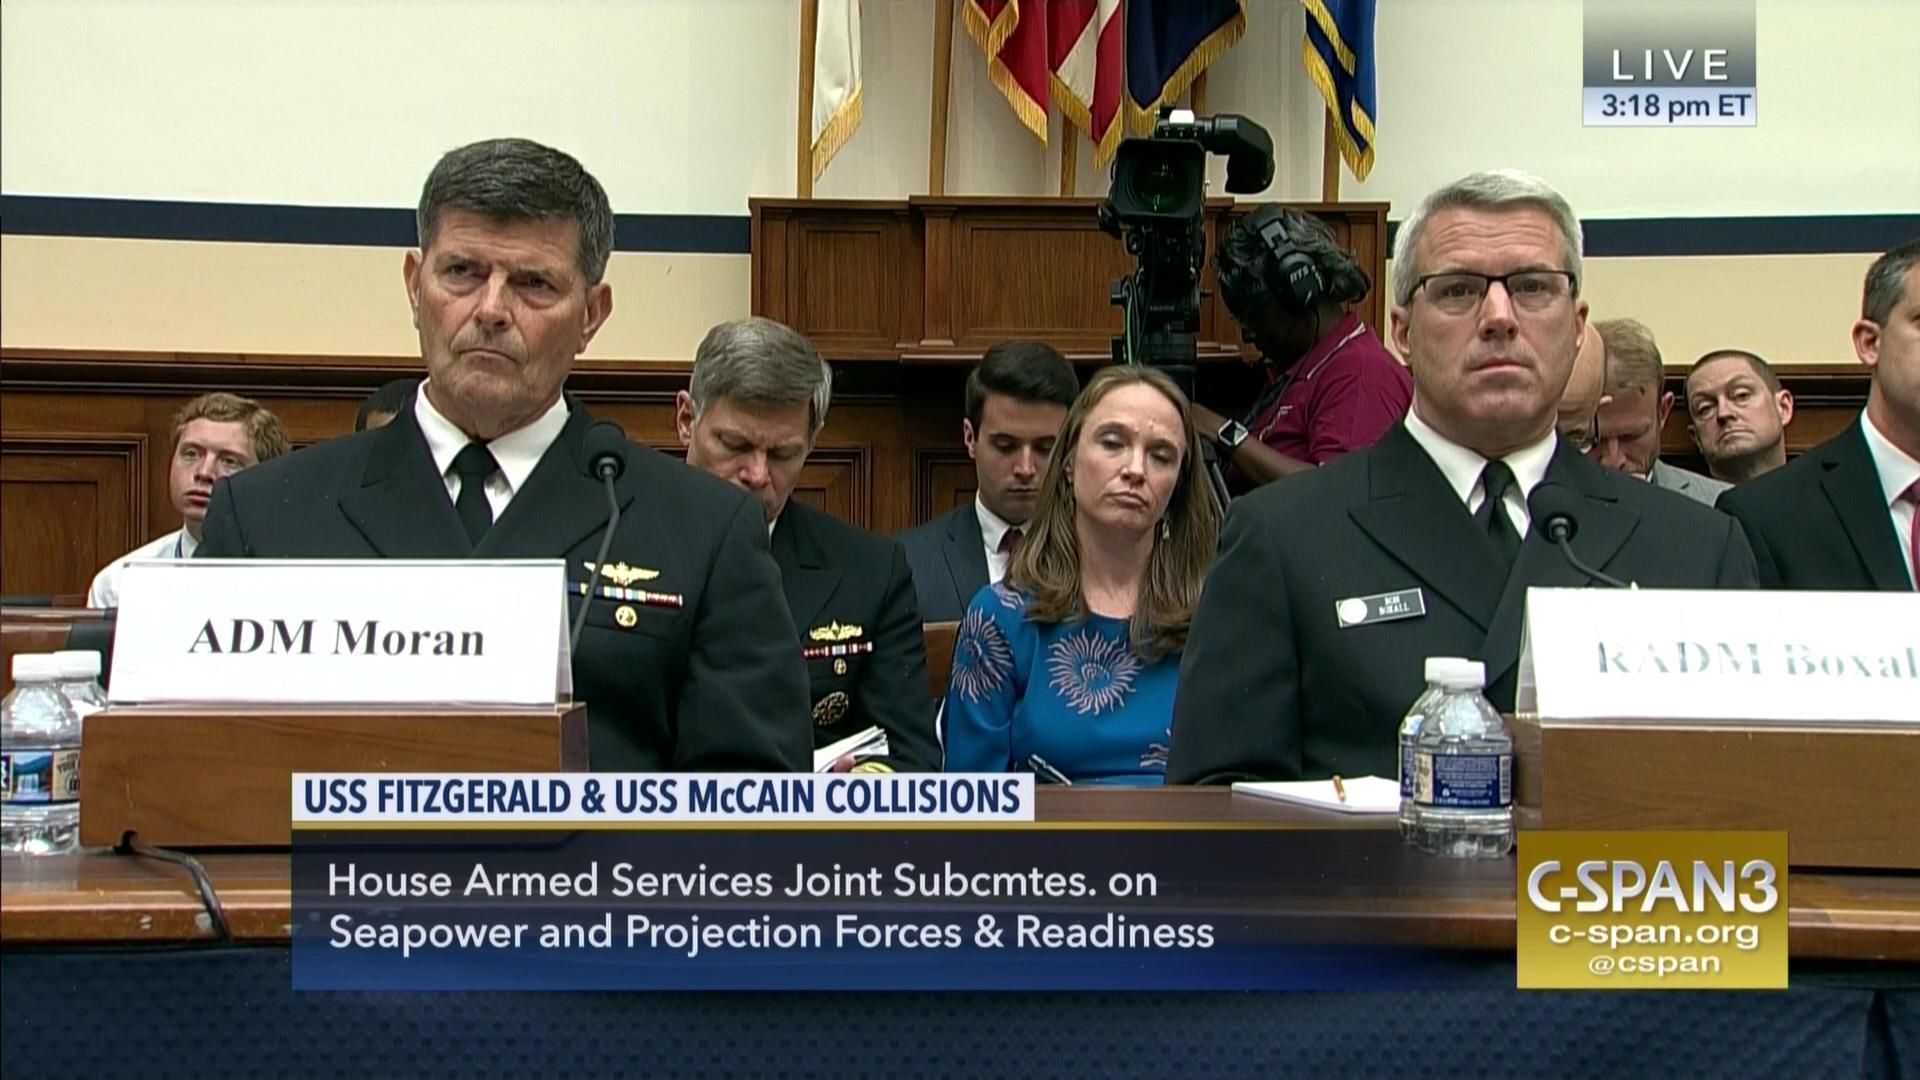 admirals testify naval warship accidents, sep 7 2017 | c-span